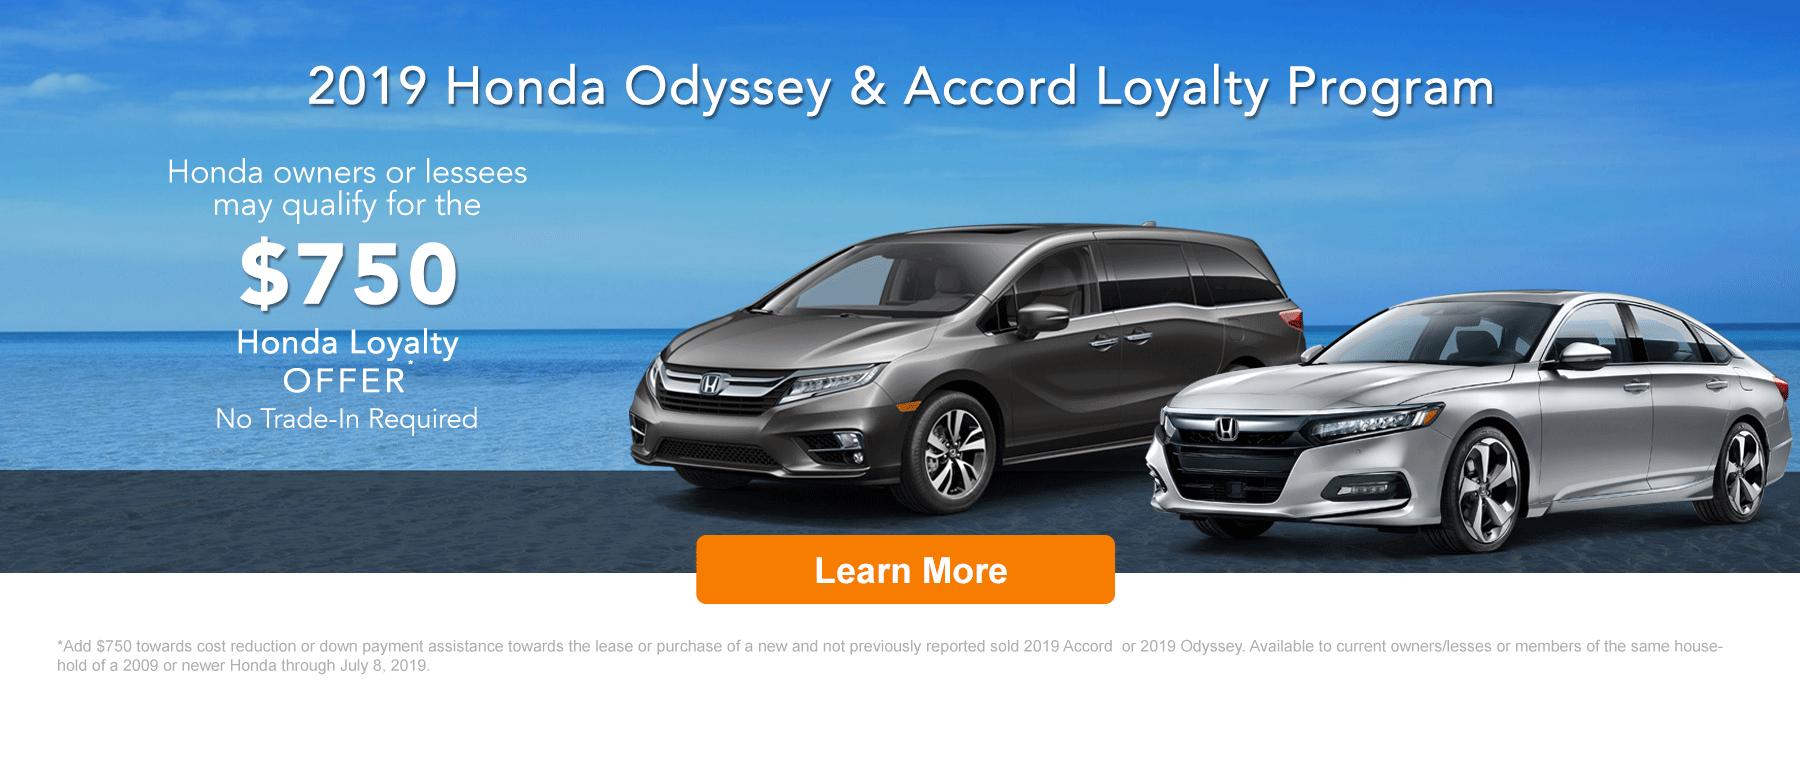 Honda Accord Odyssey Loyalty Program DI Banner